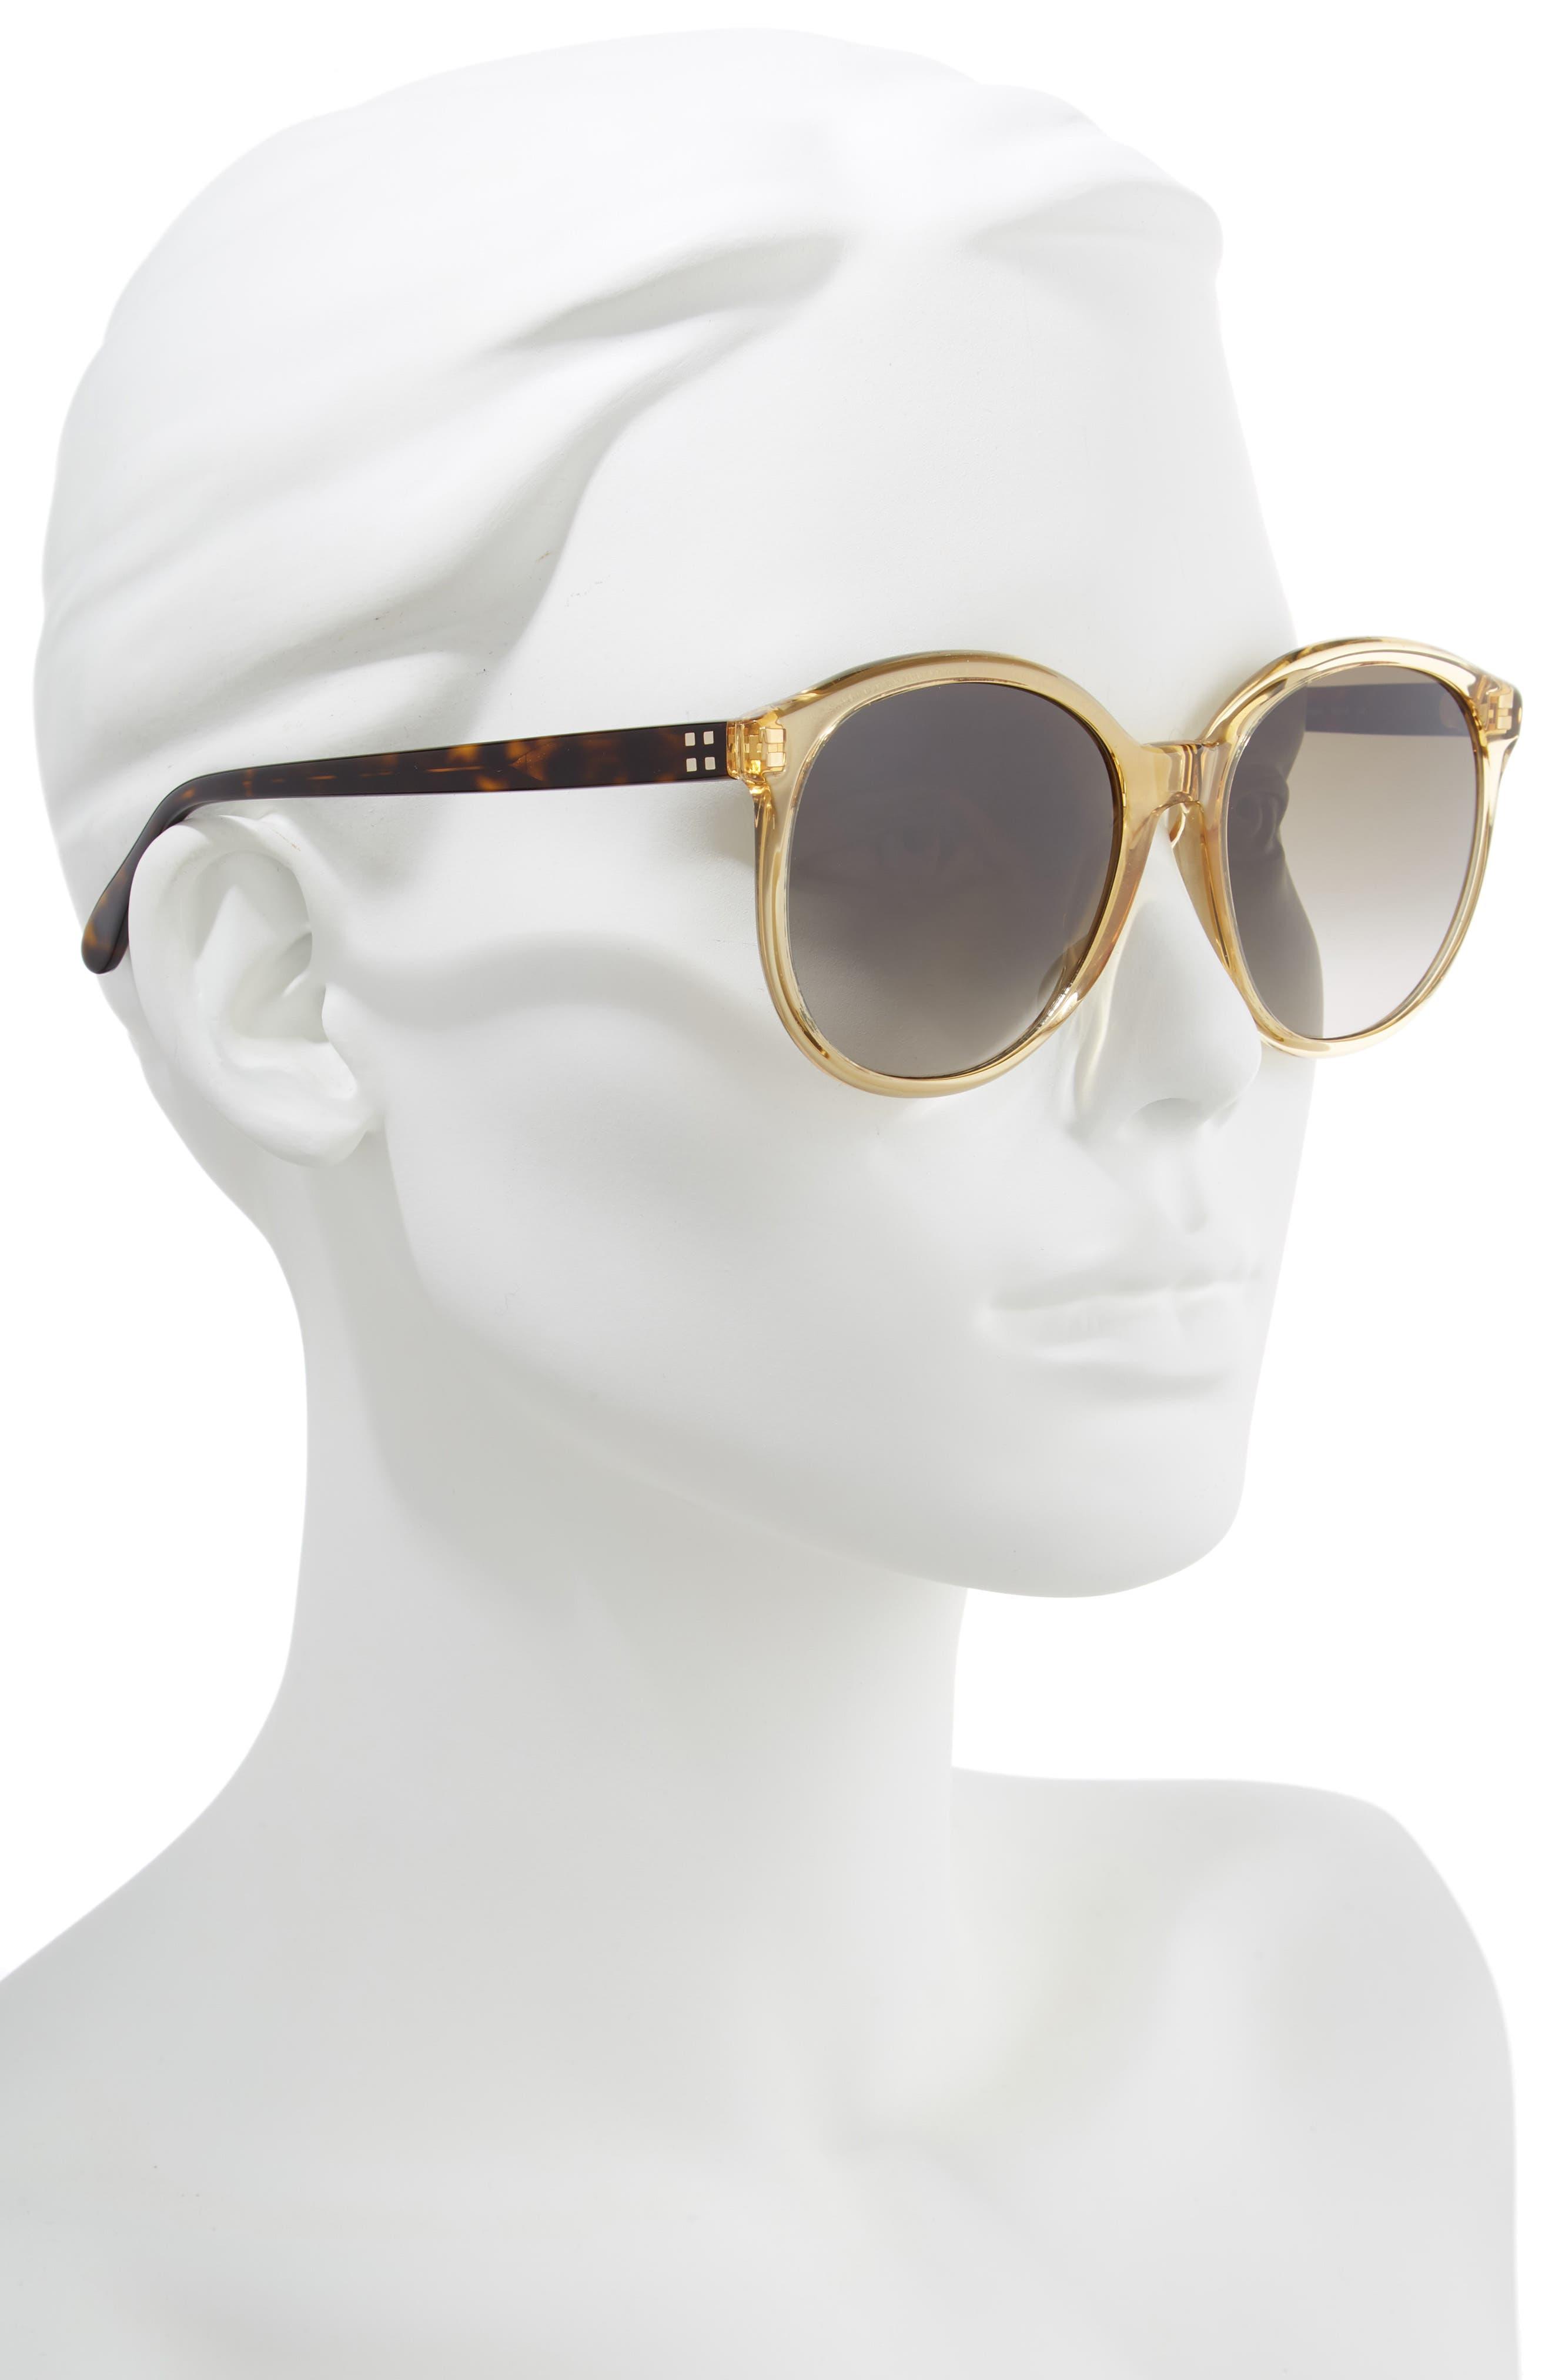 7e4cd6369c1a Givenchy Sunglasses for Women